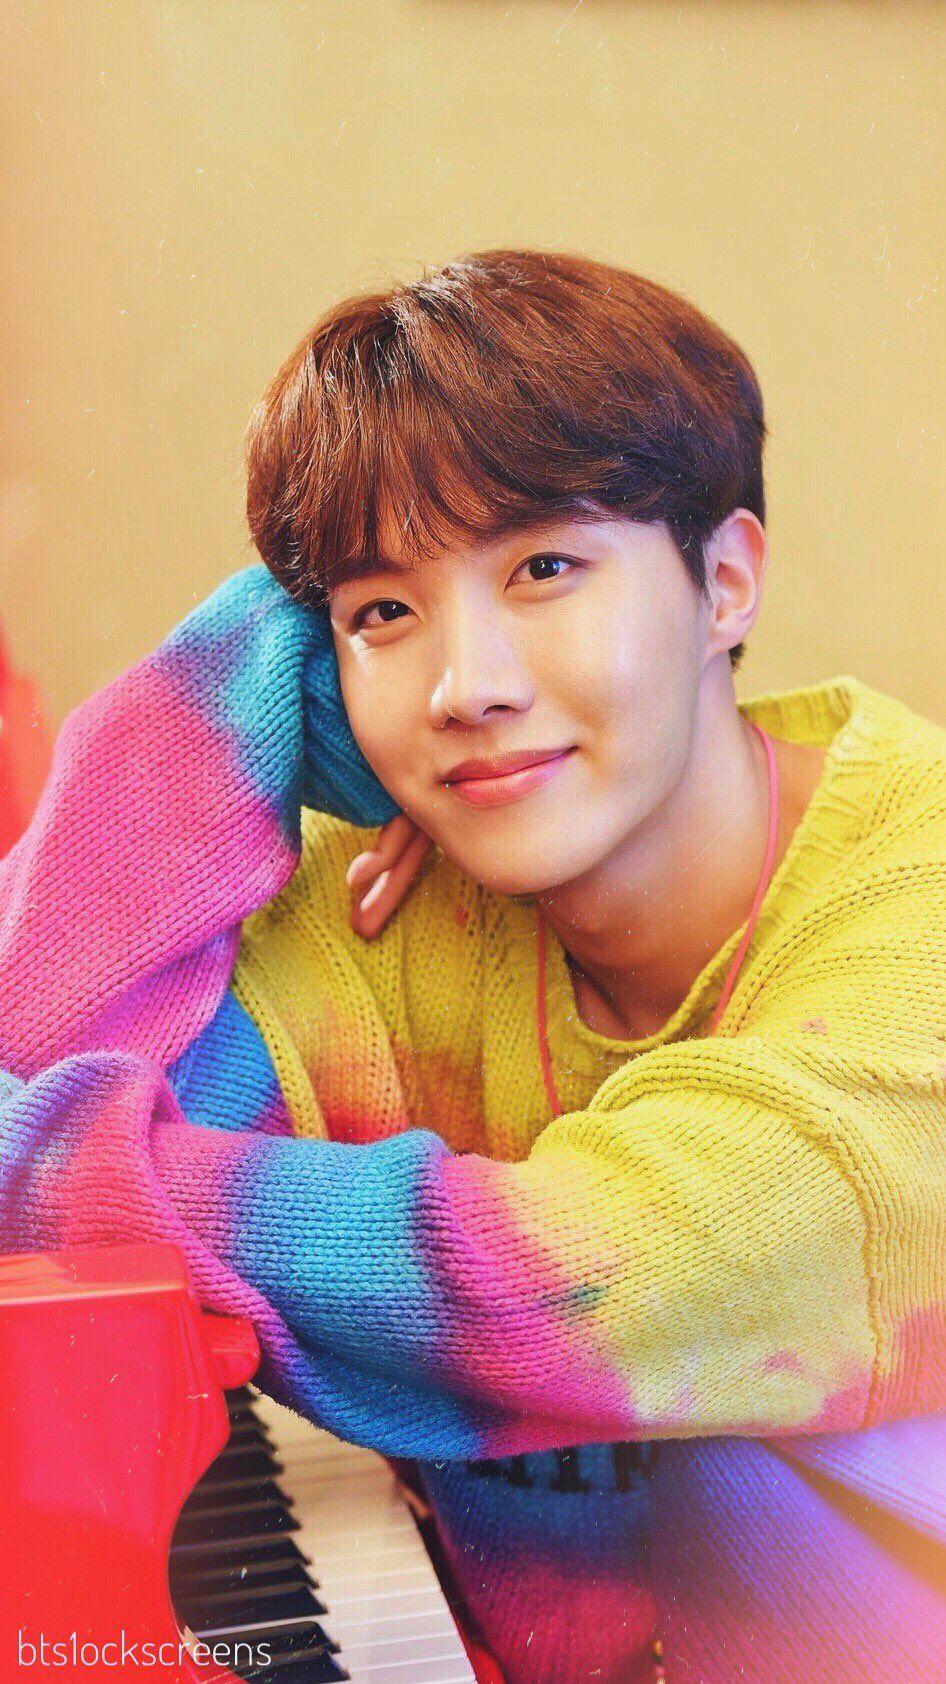 On Twitter Bts J Hope Jhope Cute Jung Hoseok Bts j hope wallpaper cute